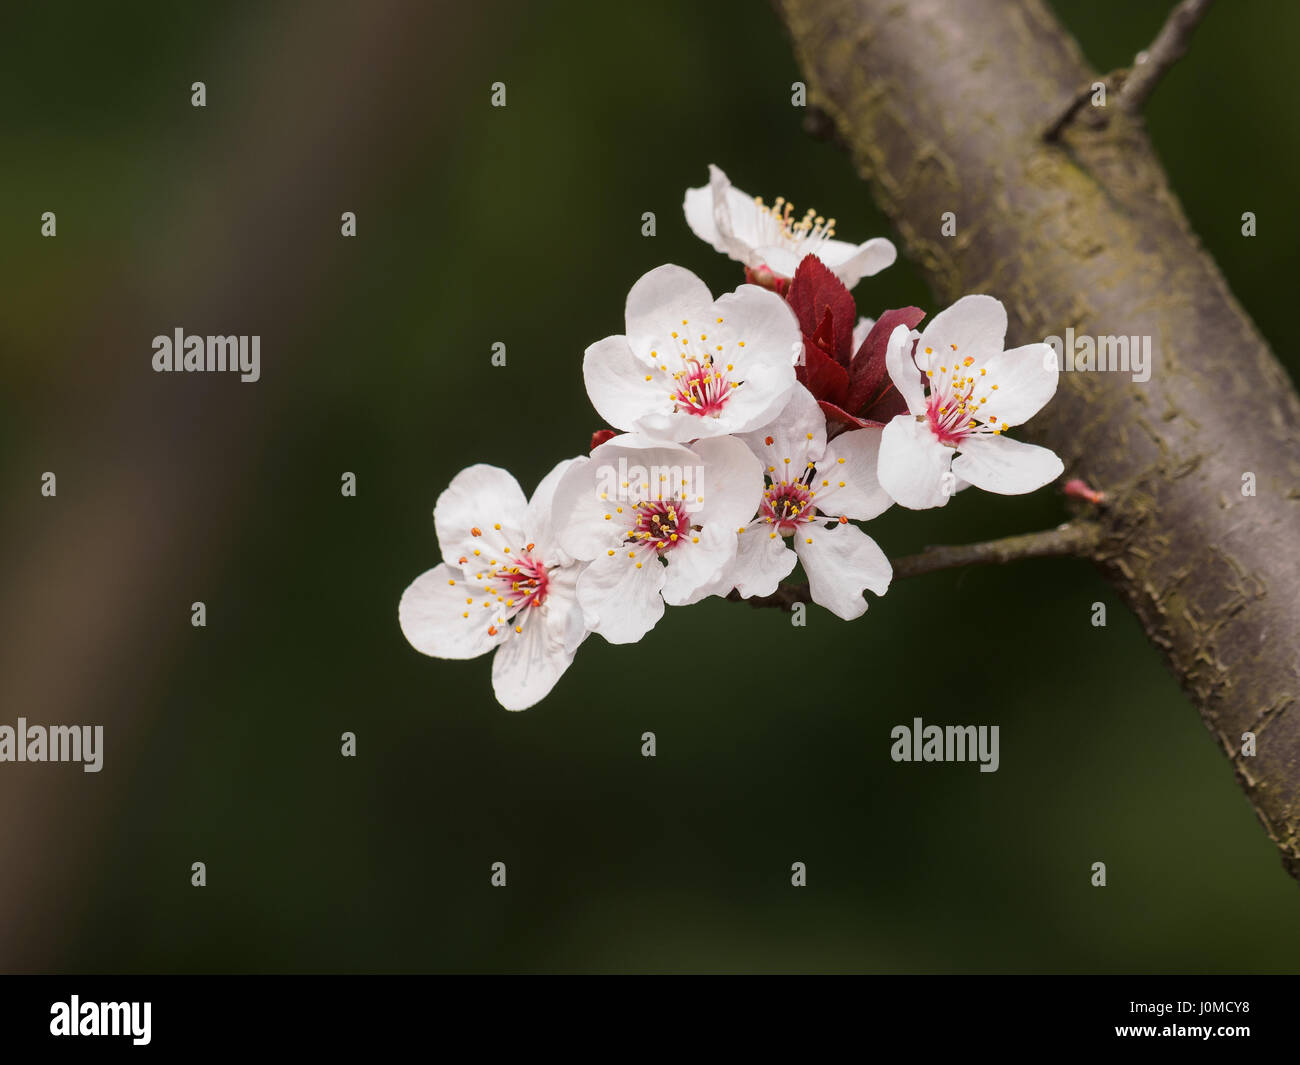 Spring Flowers Series Prunus Cerasifera Or Common Names Cherry Plum